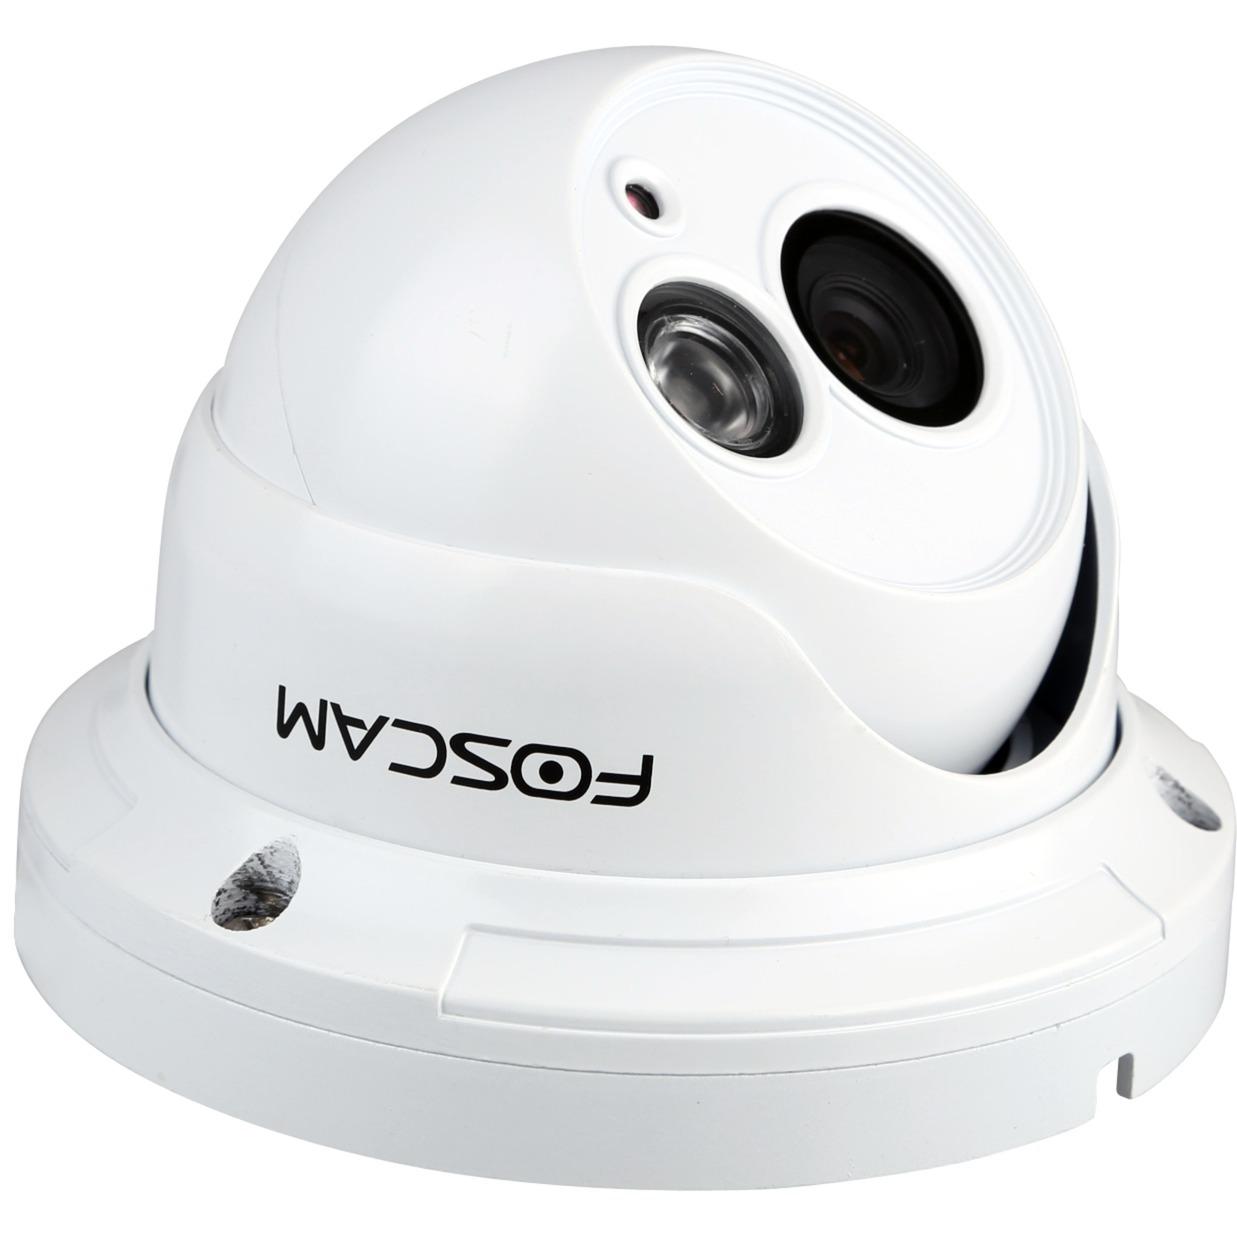 FI9853EP IP security camera Extérieur Dome Blanc caméra de sécurité, Caméra réseau